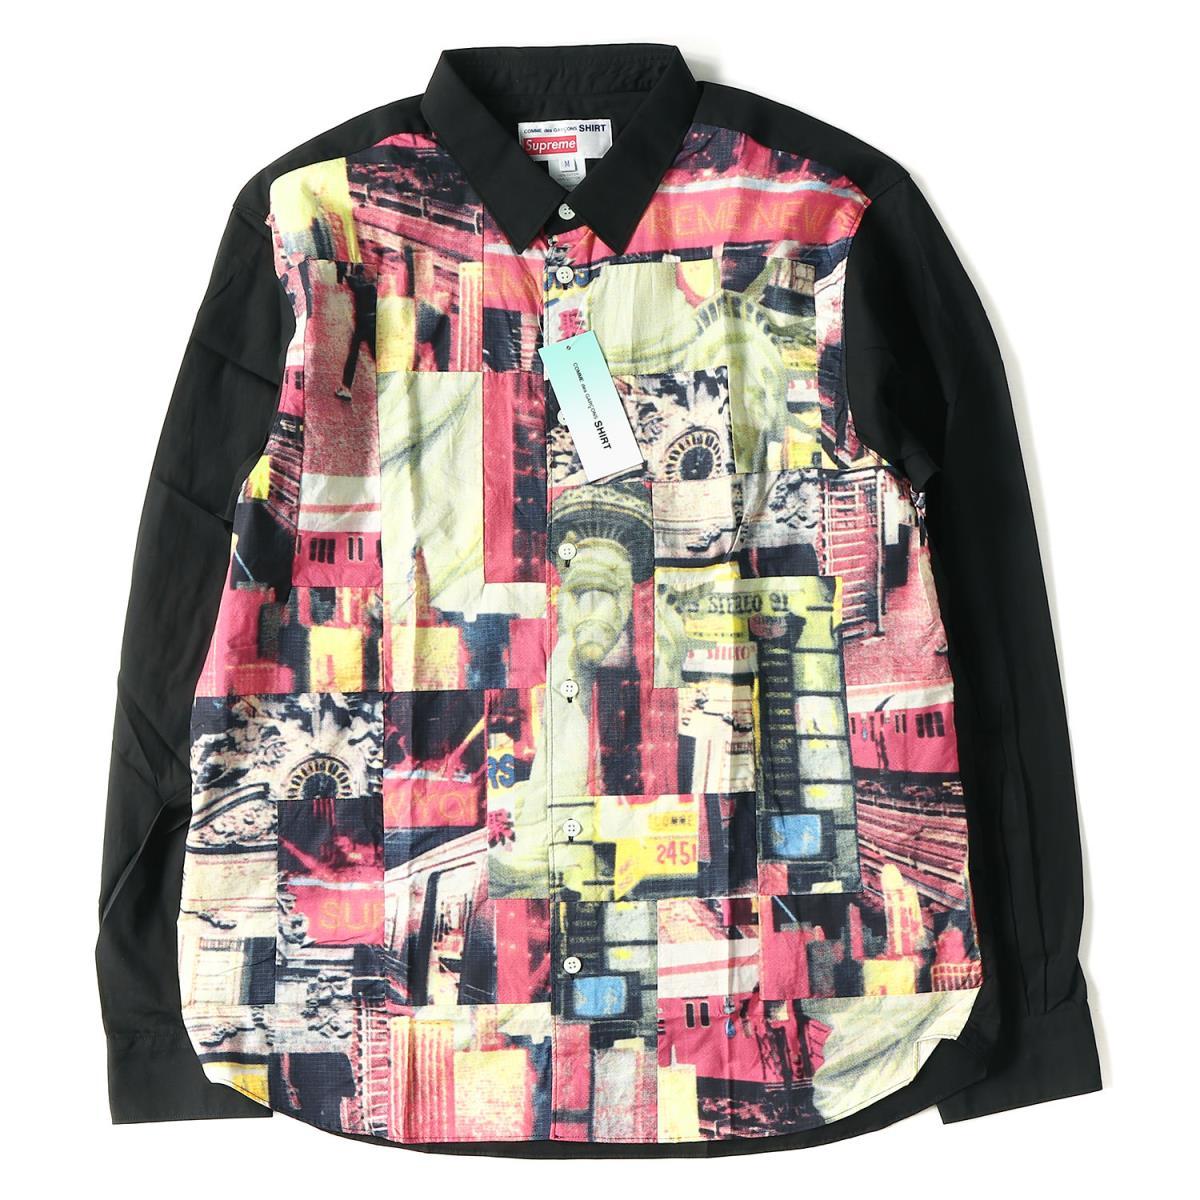 Supreme (シュプリーム) 18A/W ×COMME des GARCONS パッチワークシャツ(Patchwork Button Shirt) ブラック M 【メンズ】【K2079】【あす楽☆対応可】